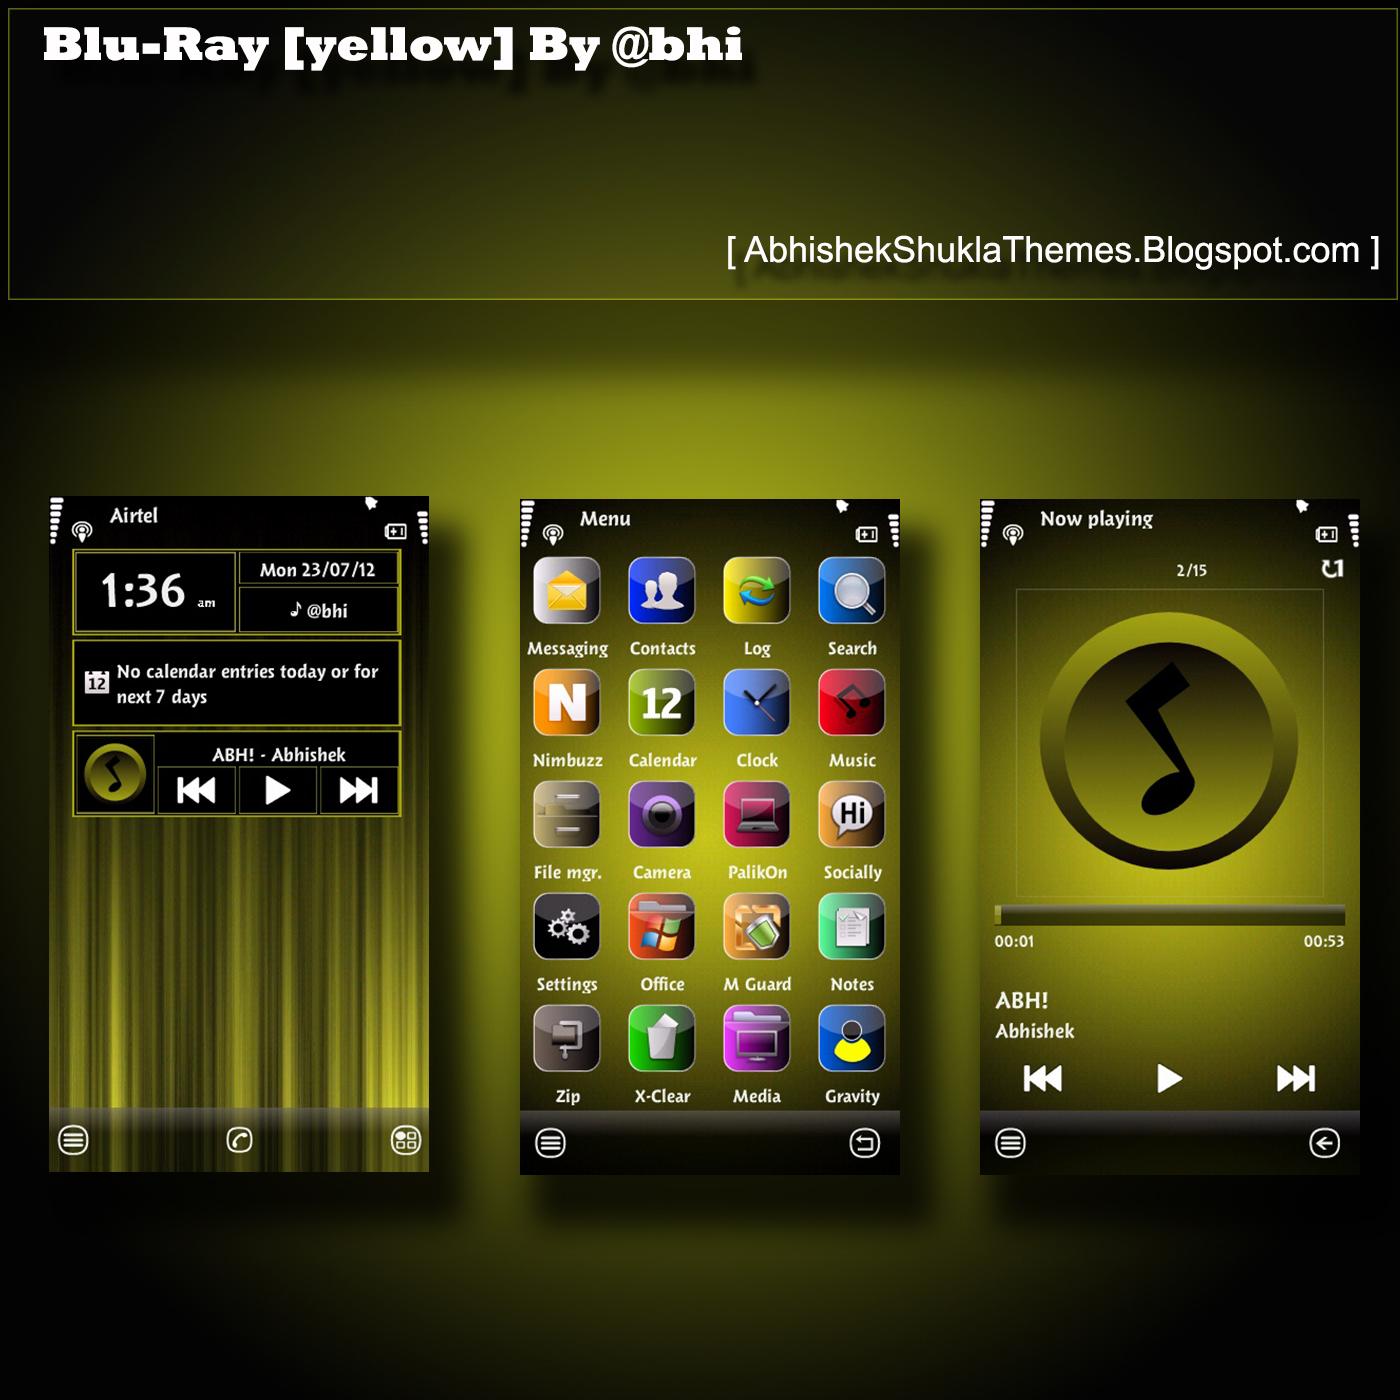 Blu-Ray [Yellow] By @bhi   @bhi [Abhishek Shukla]